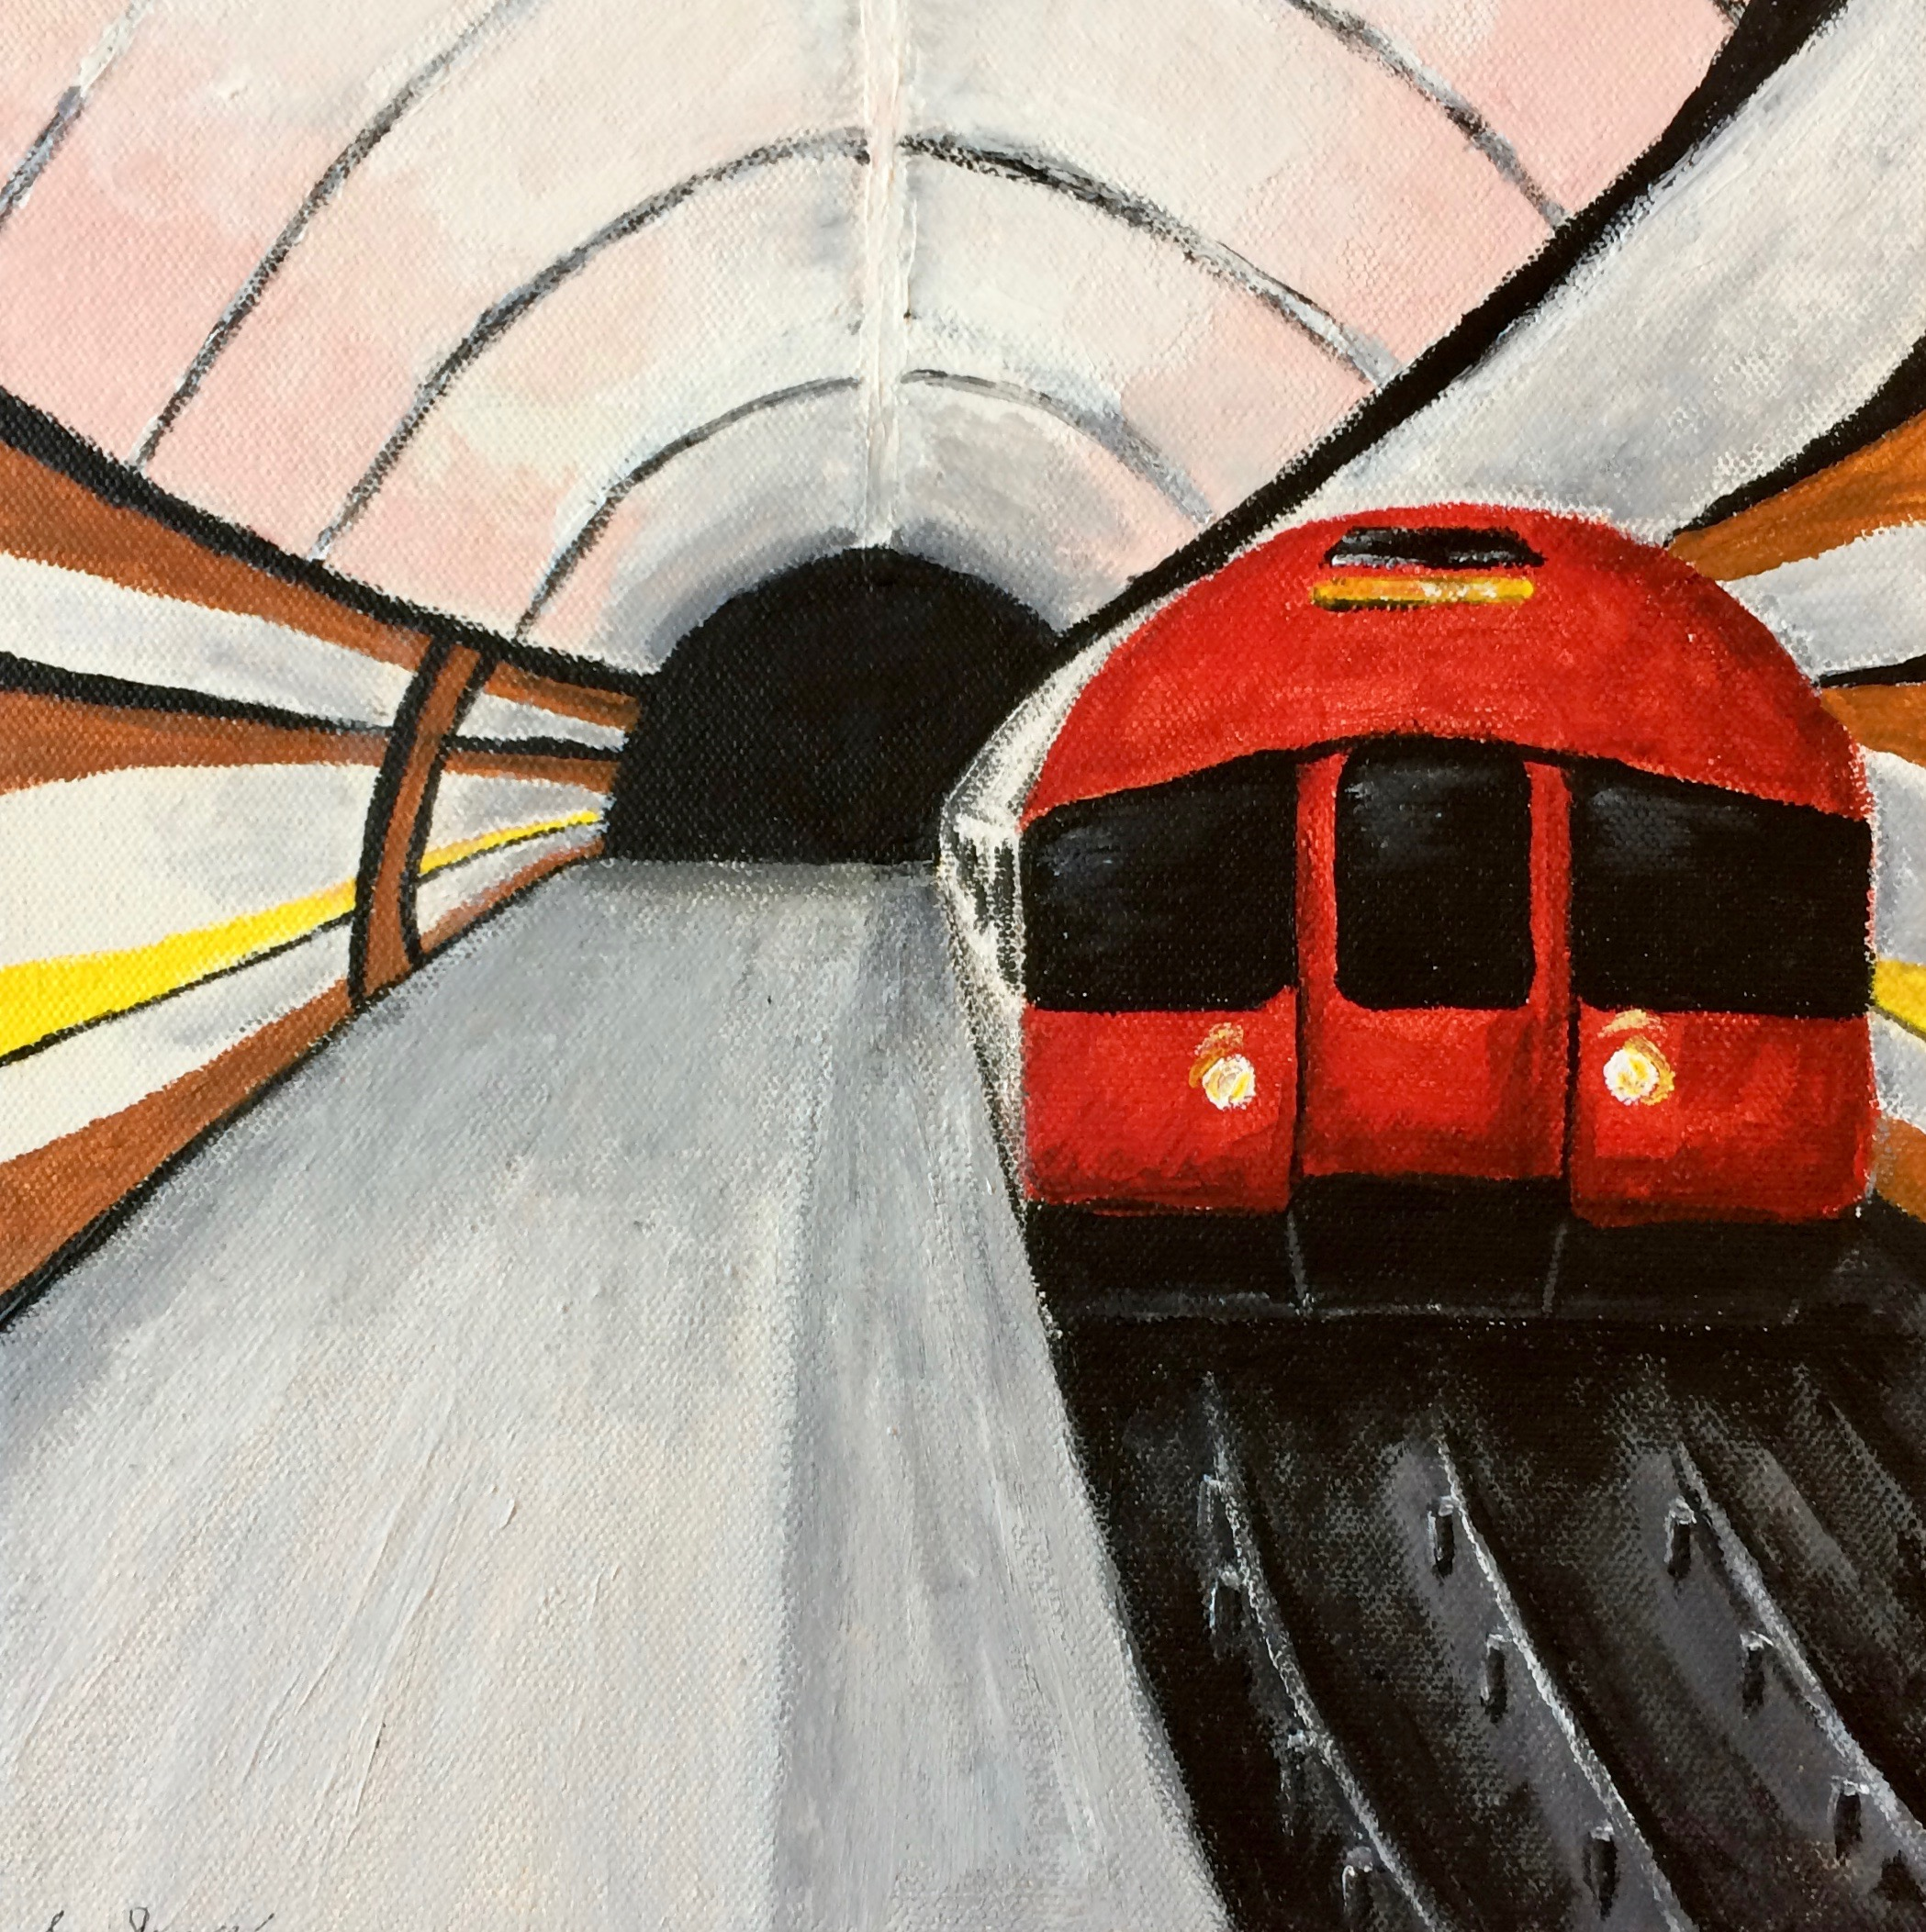 Cruisin' on the Tube - Simru Sonmez-Erbil